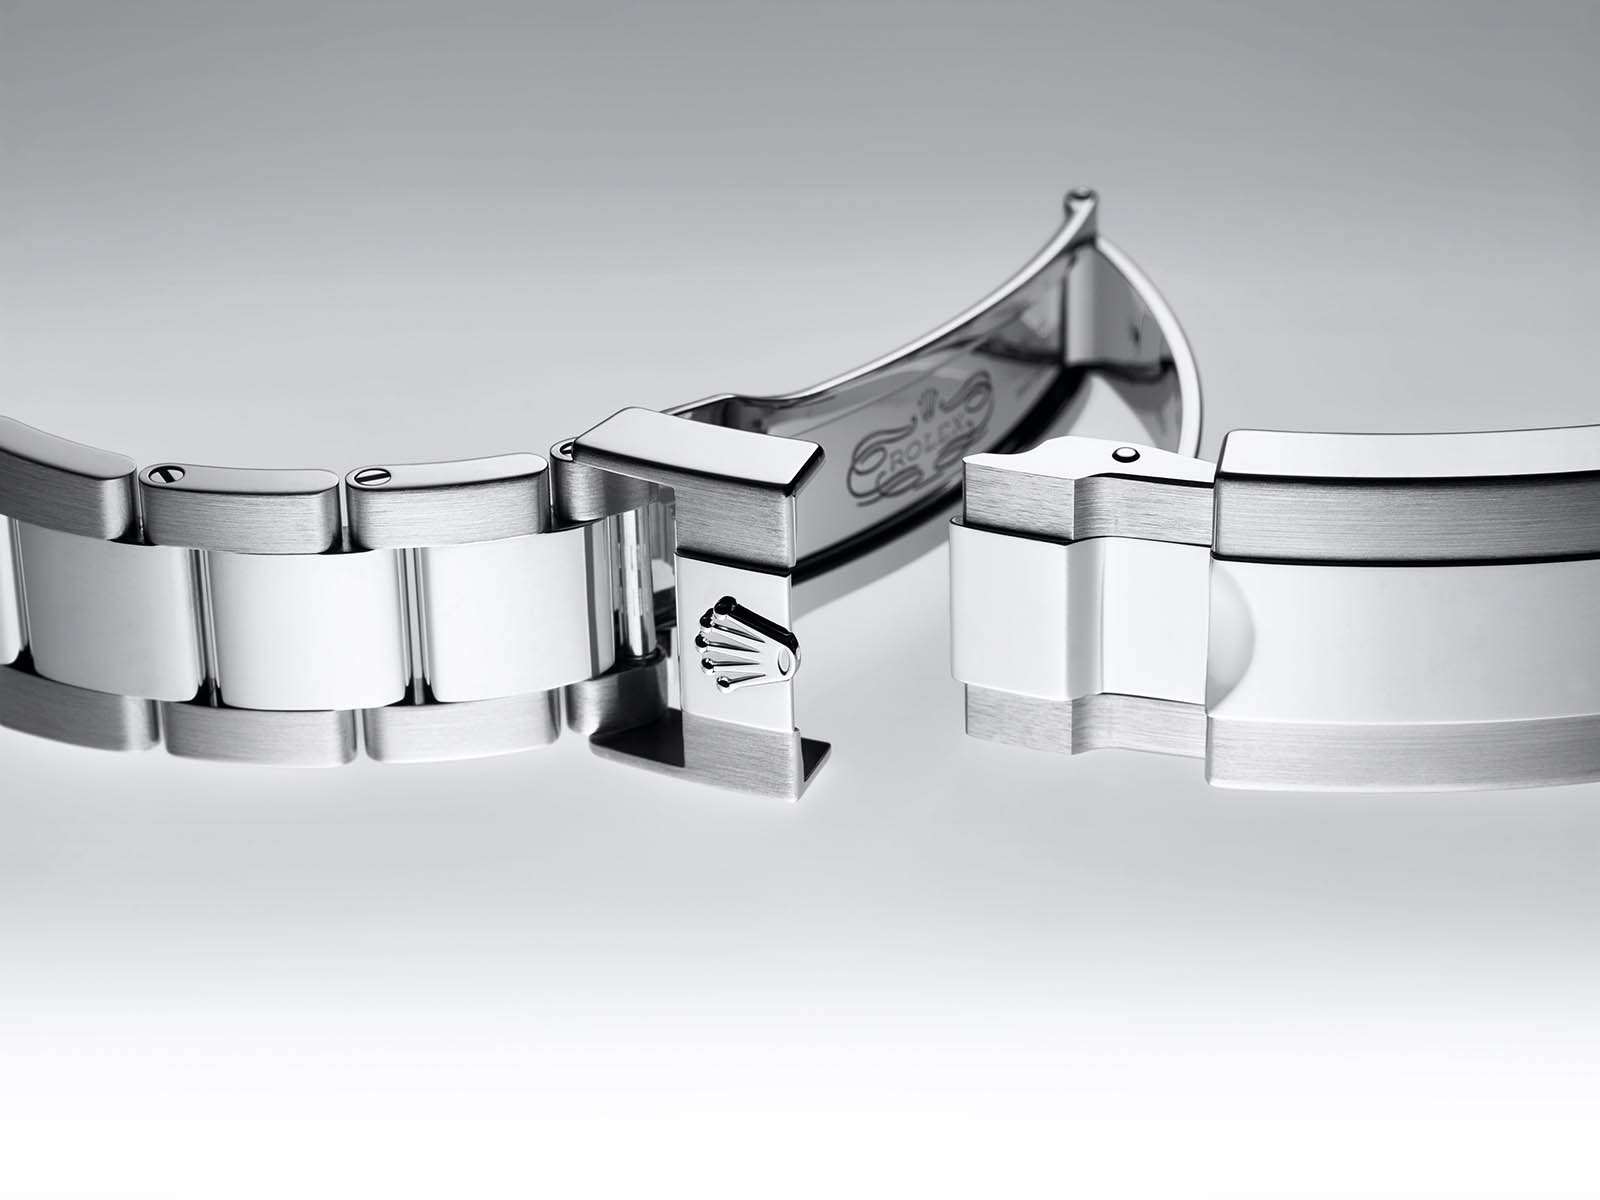 rolex-bracelets-and-straps-oysterlock-1.jpg